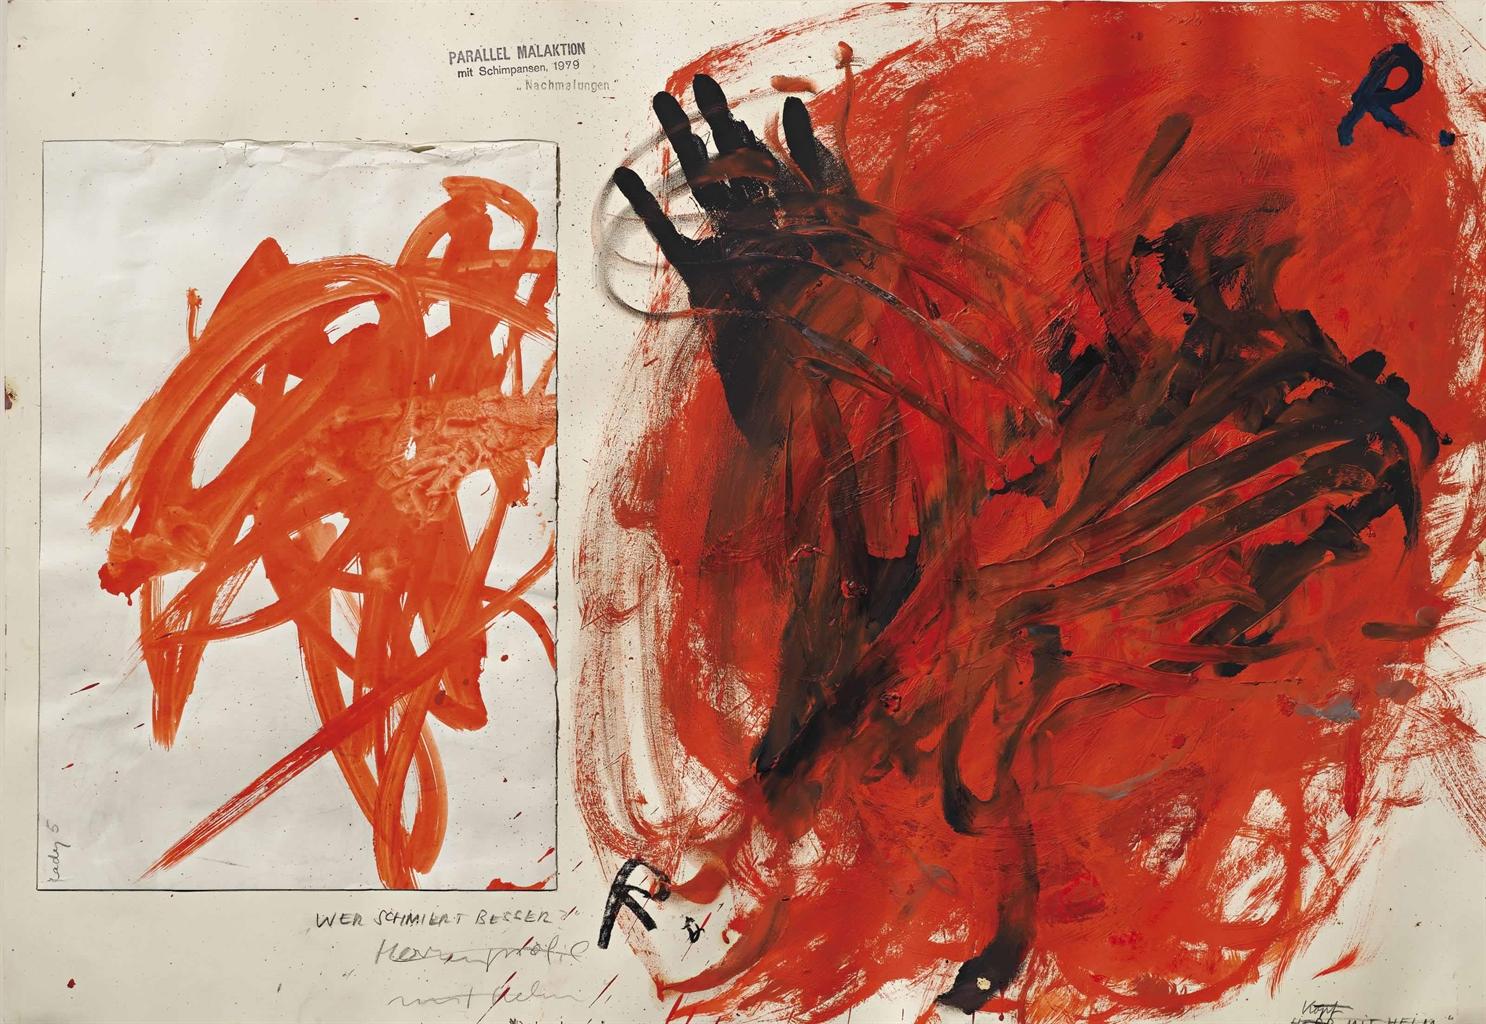 Arnulf Rainer-Parallel Malaktion mit Schimpansen (Parallel Action Painting with Chimpanzees)-1979